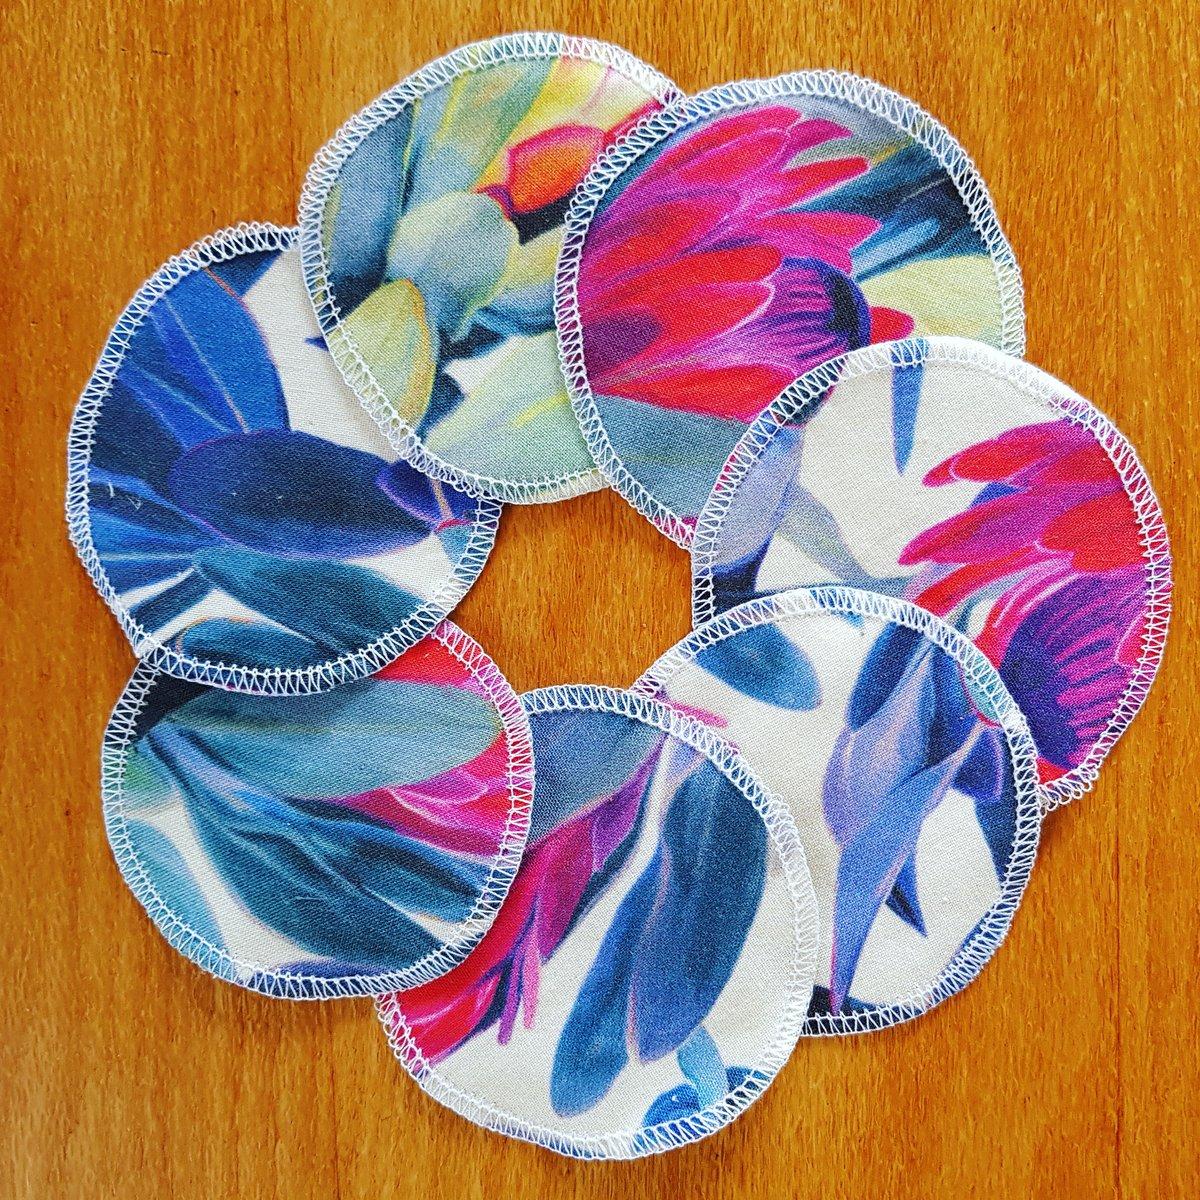 Image of Washable Make-Up Circles